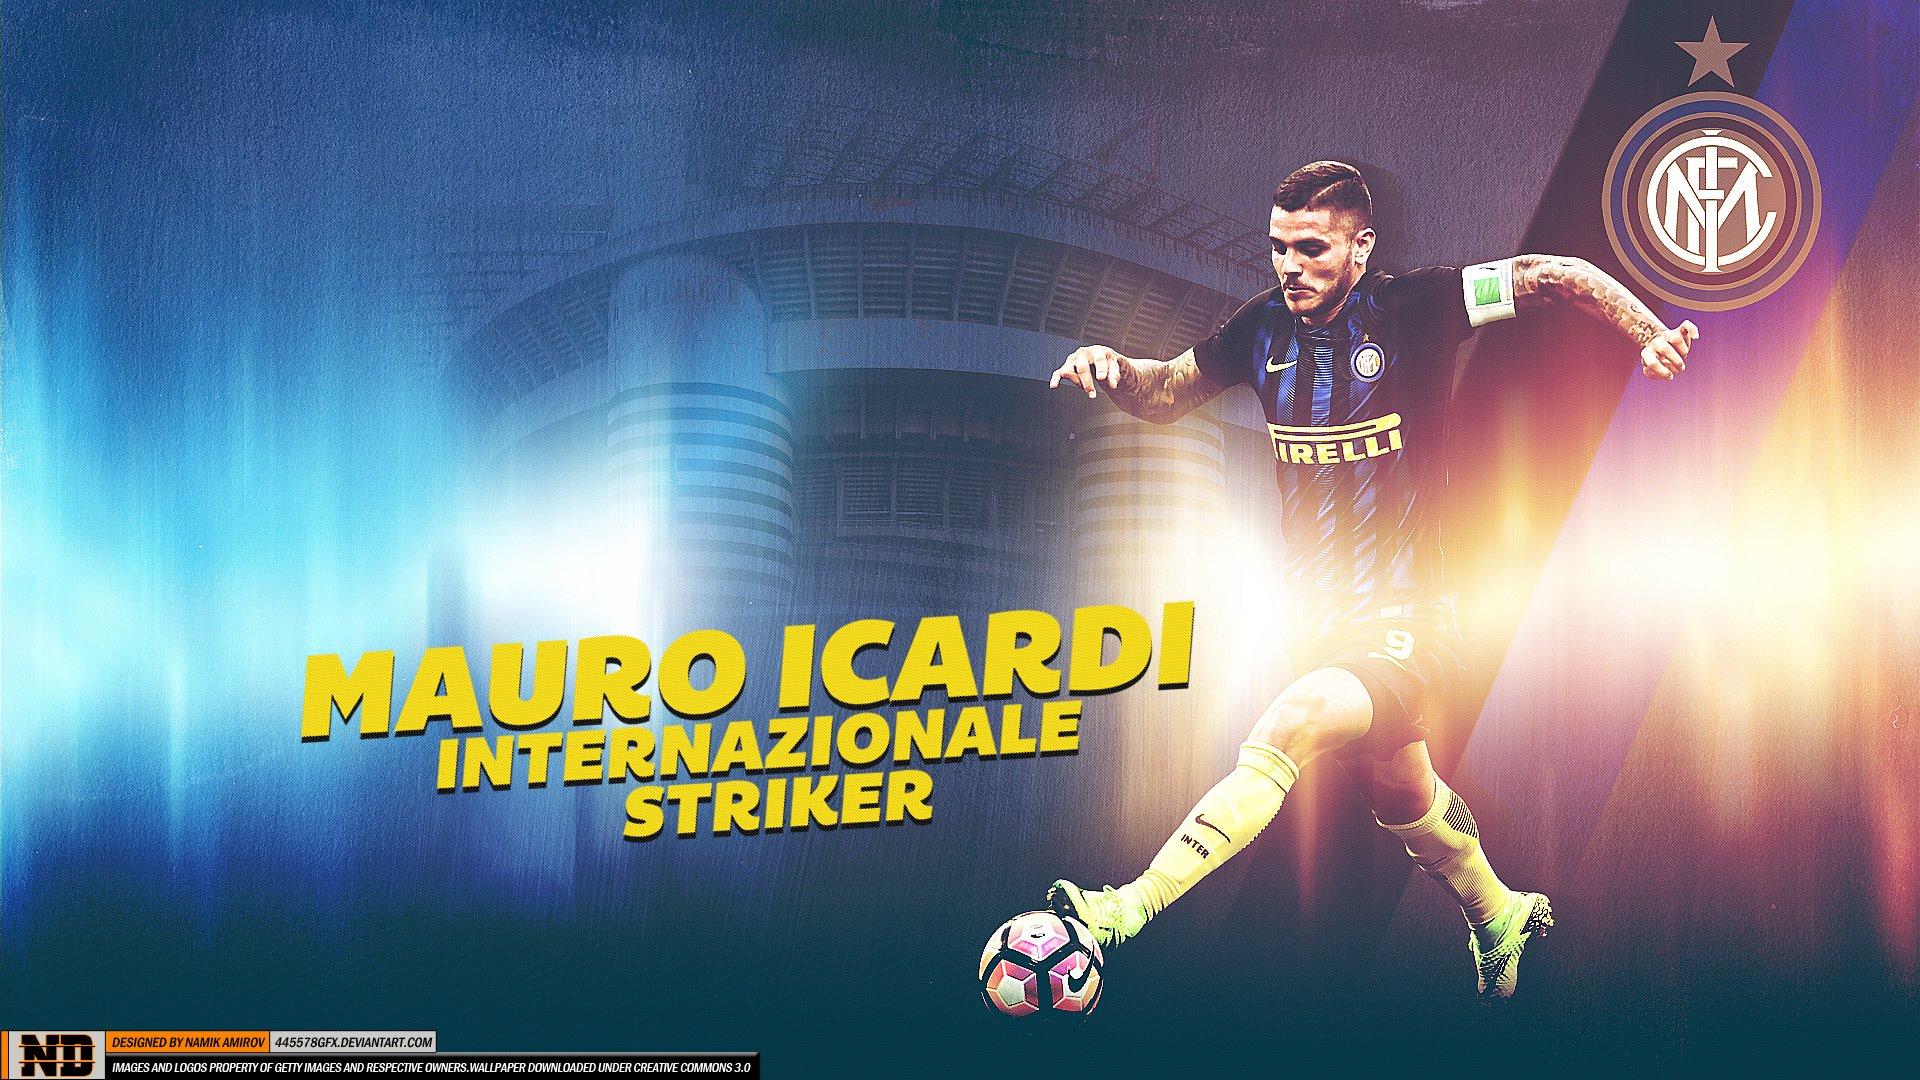 Mauro Icardi Inter Hd Wallpaper Sfondi 1920x1080 Id961919